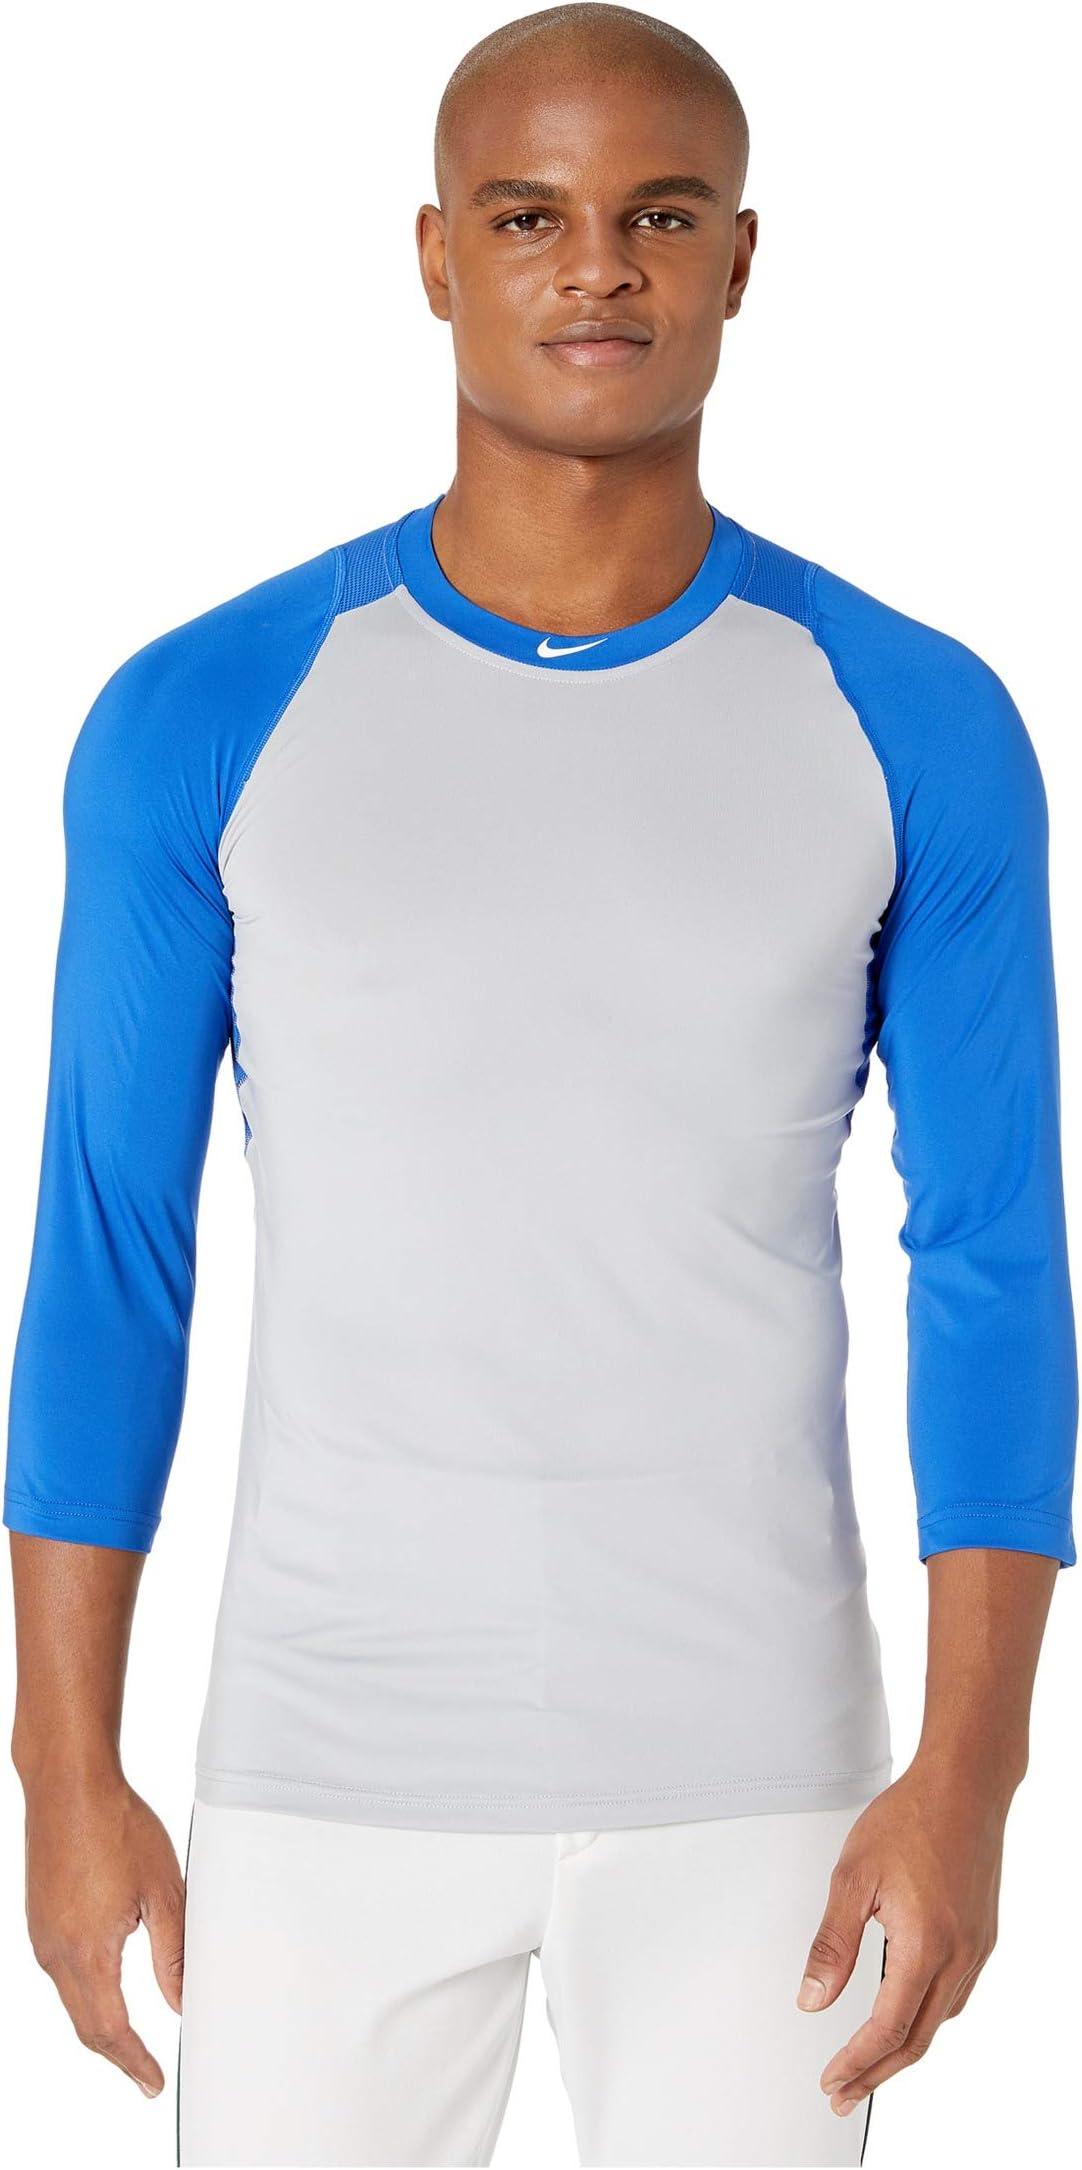 Nike Pro 3/4 Sleeve Baseball Top